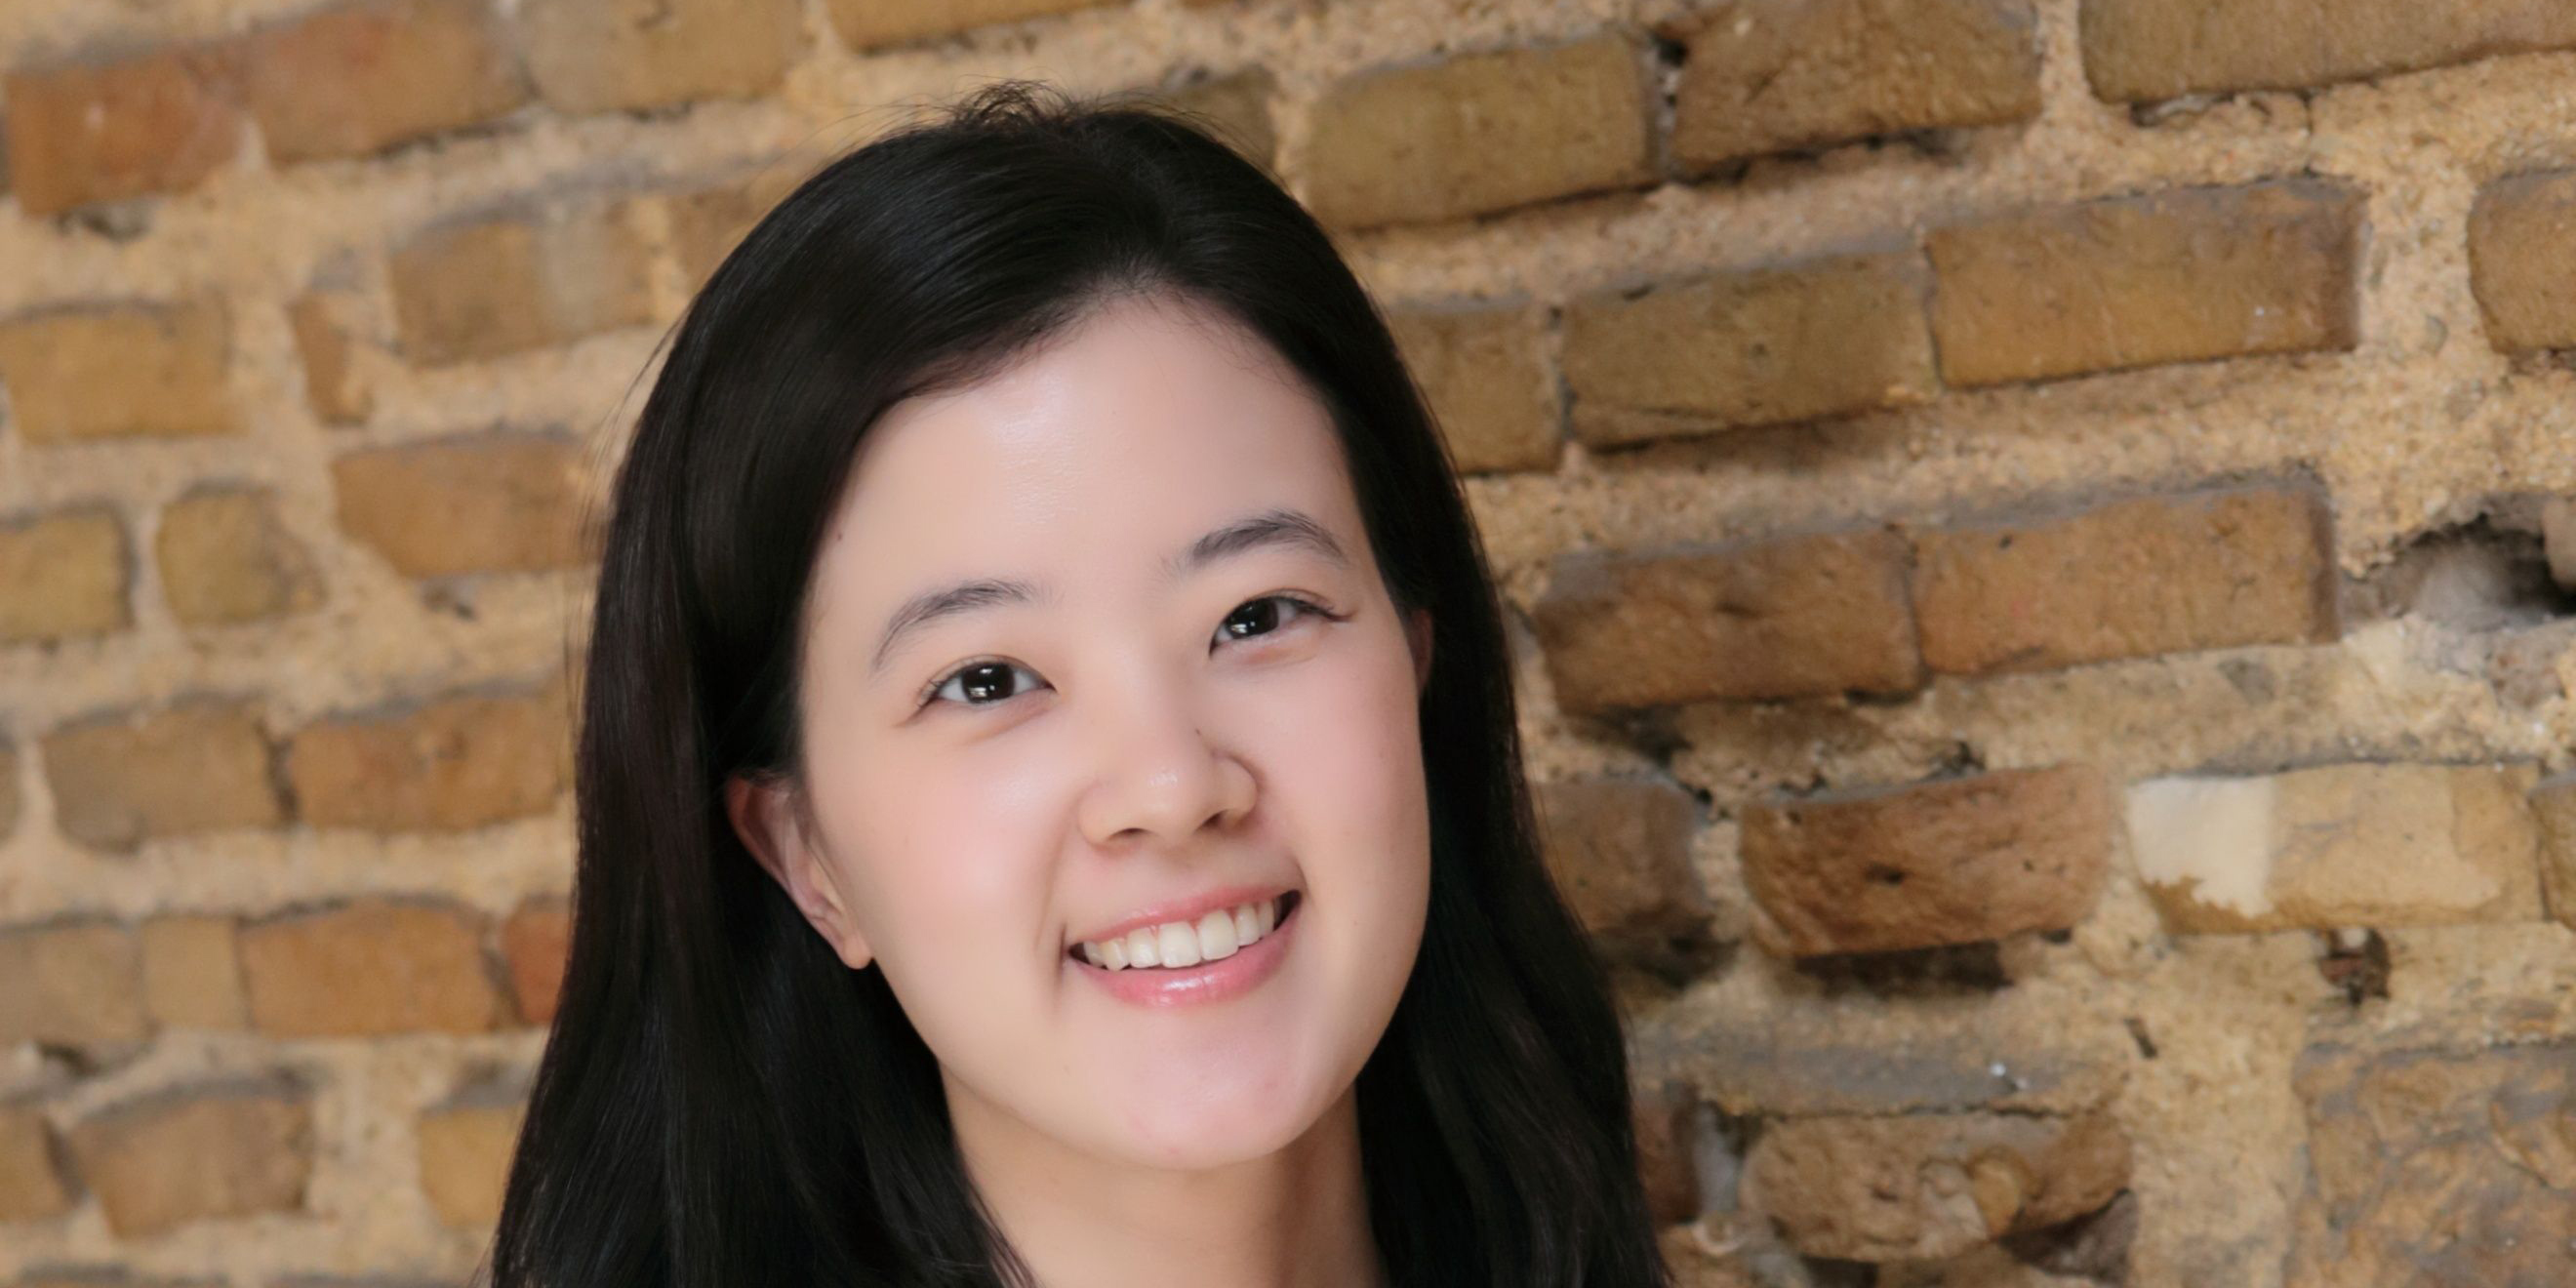 Hye Youn Choi, South Korea, participant in the GCLP 2017 edition